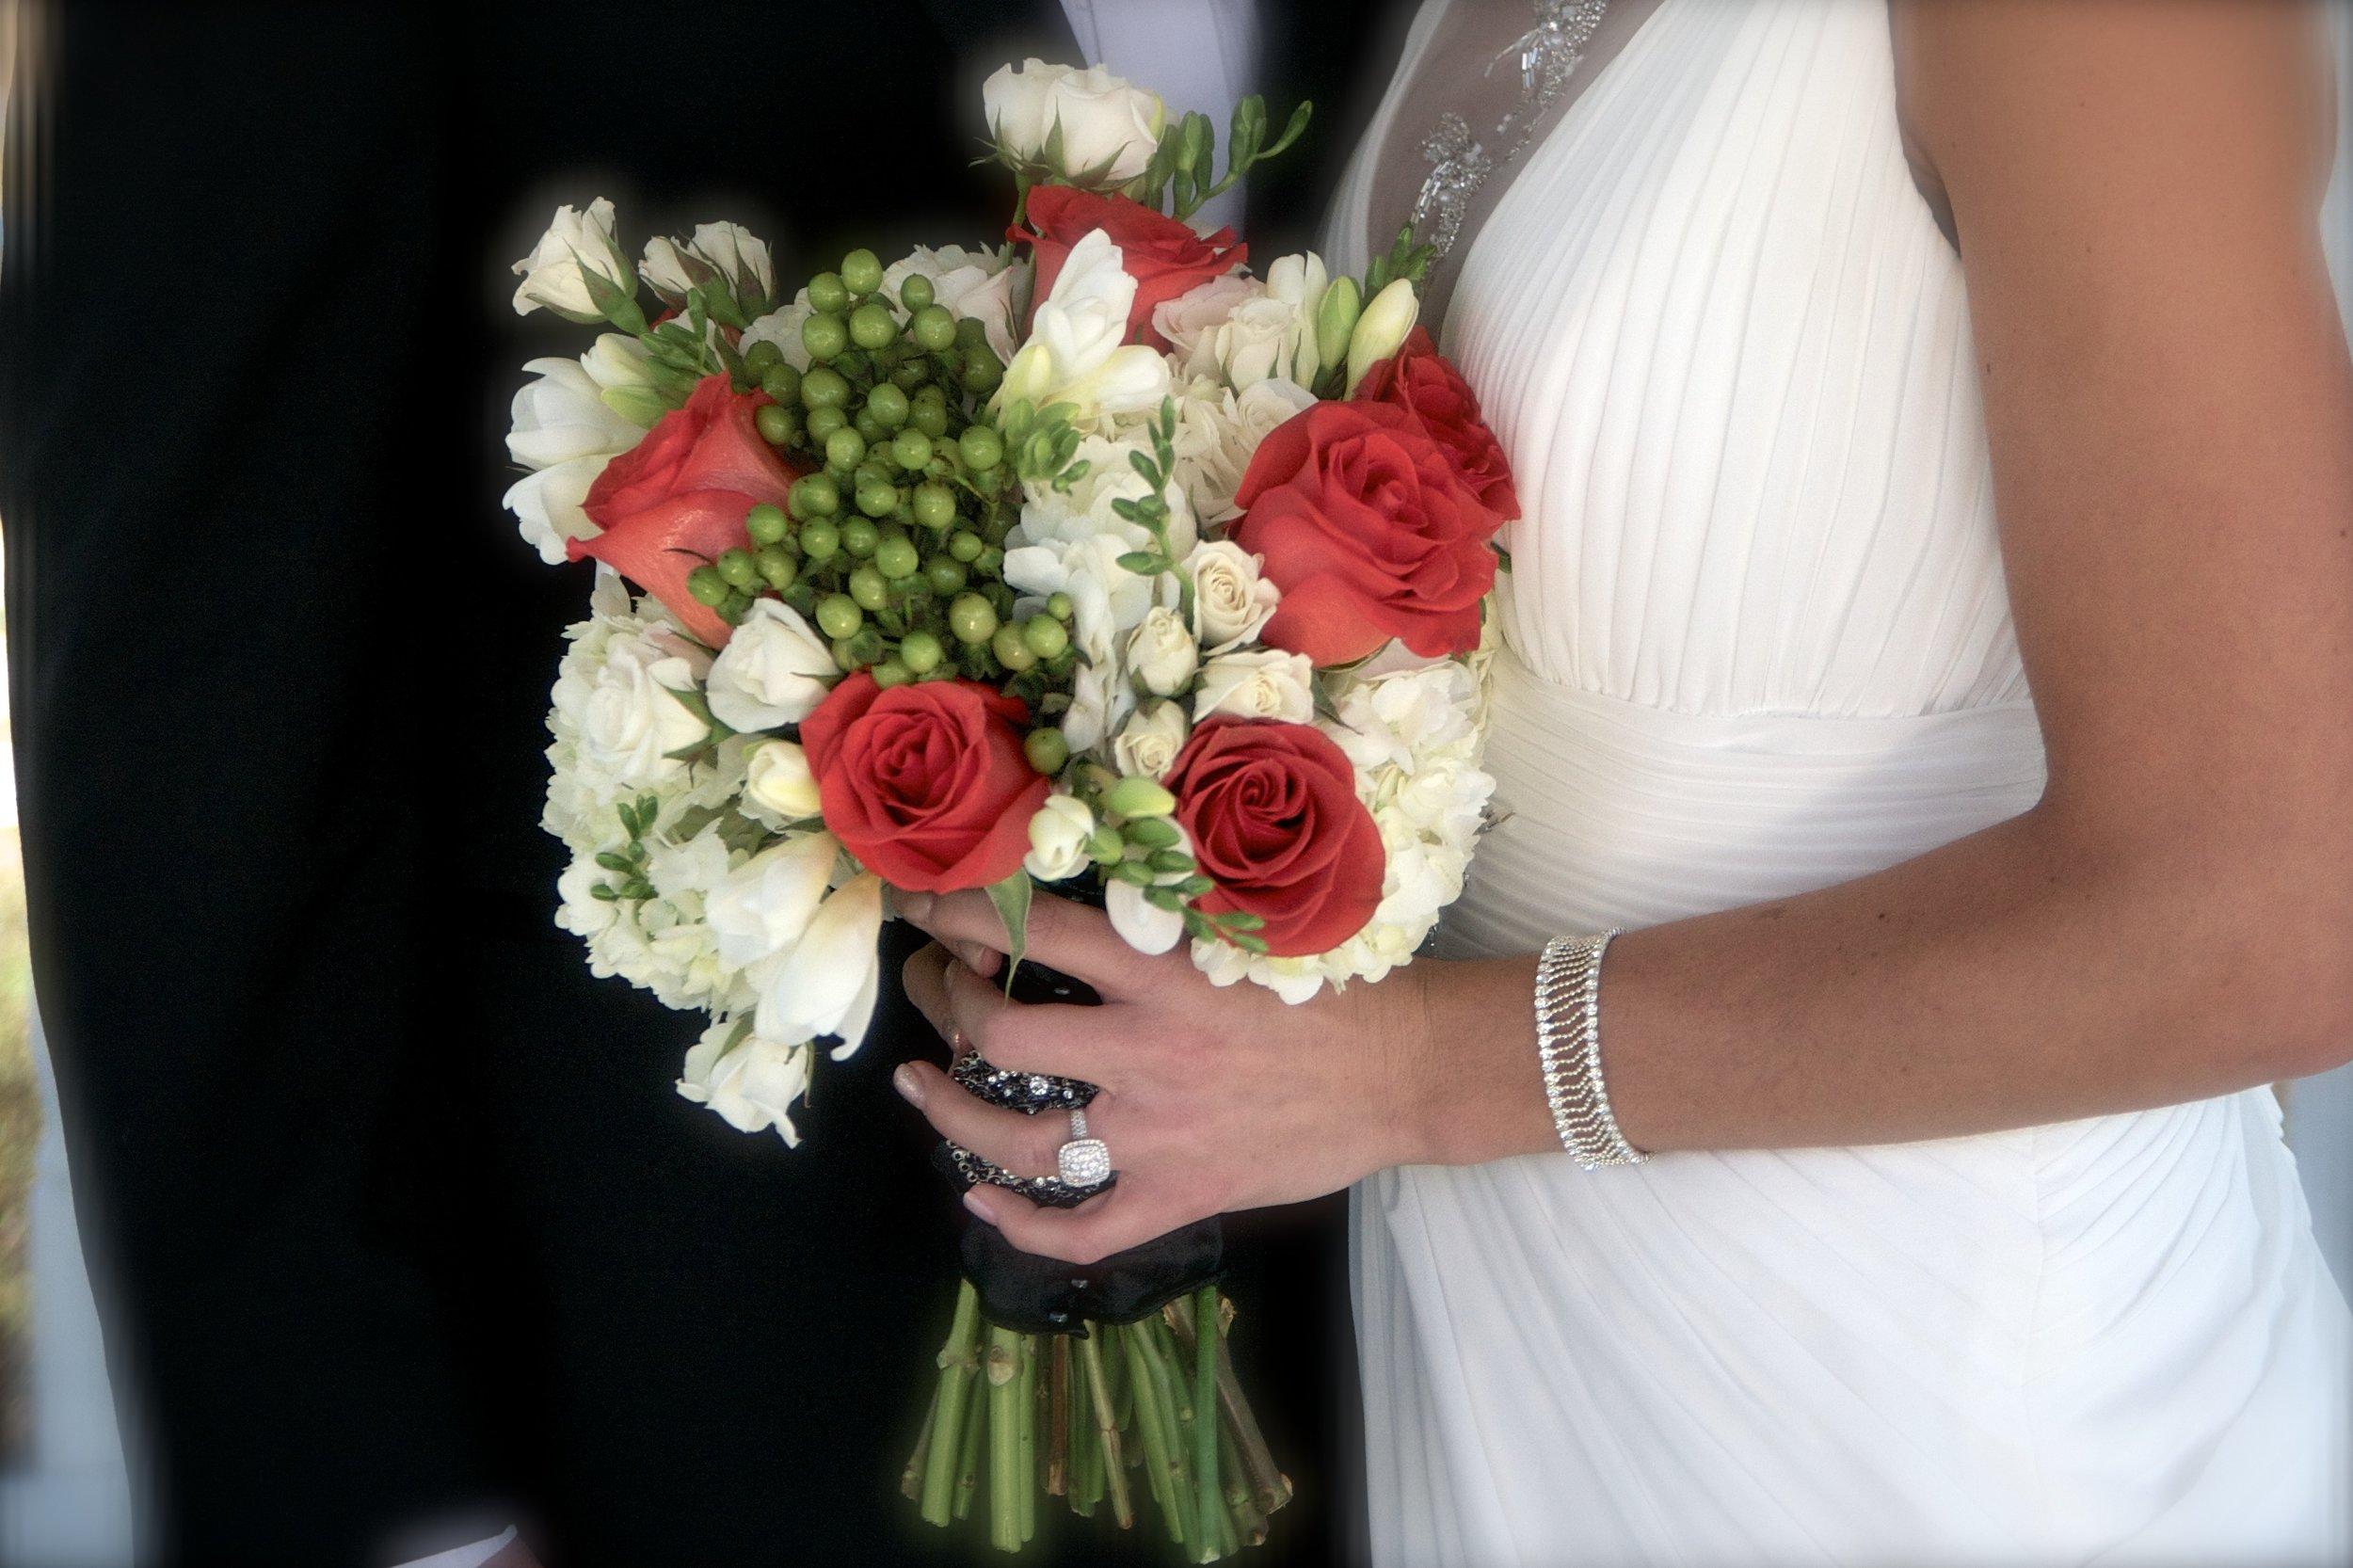 Fragrant flowers keep the groom happy!